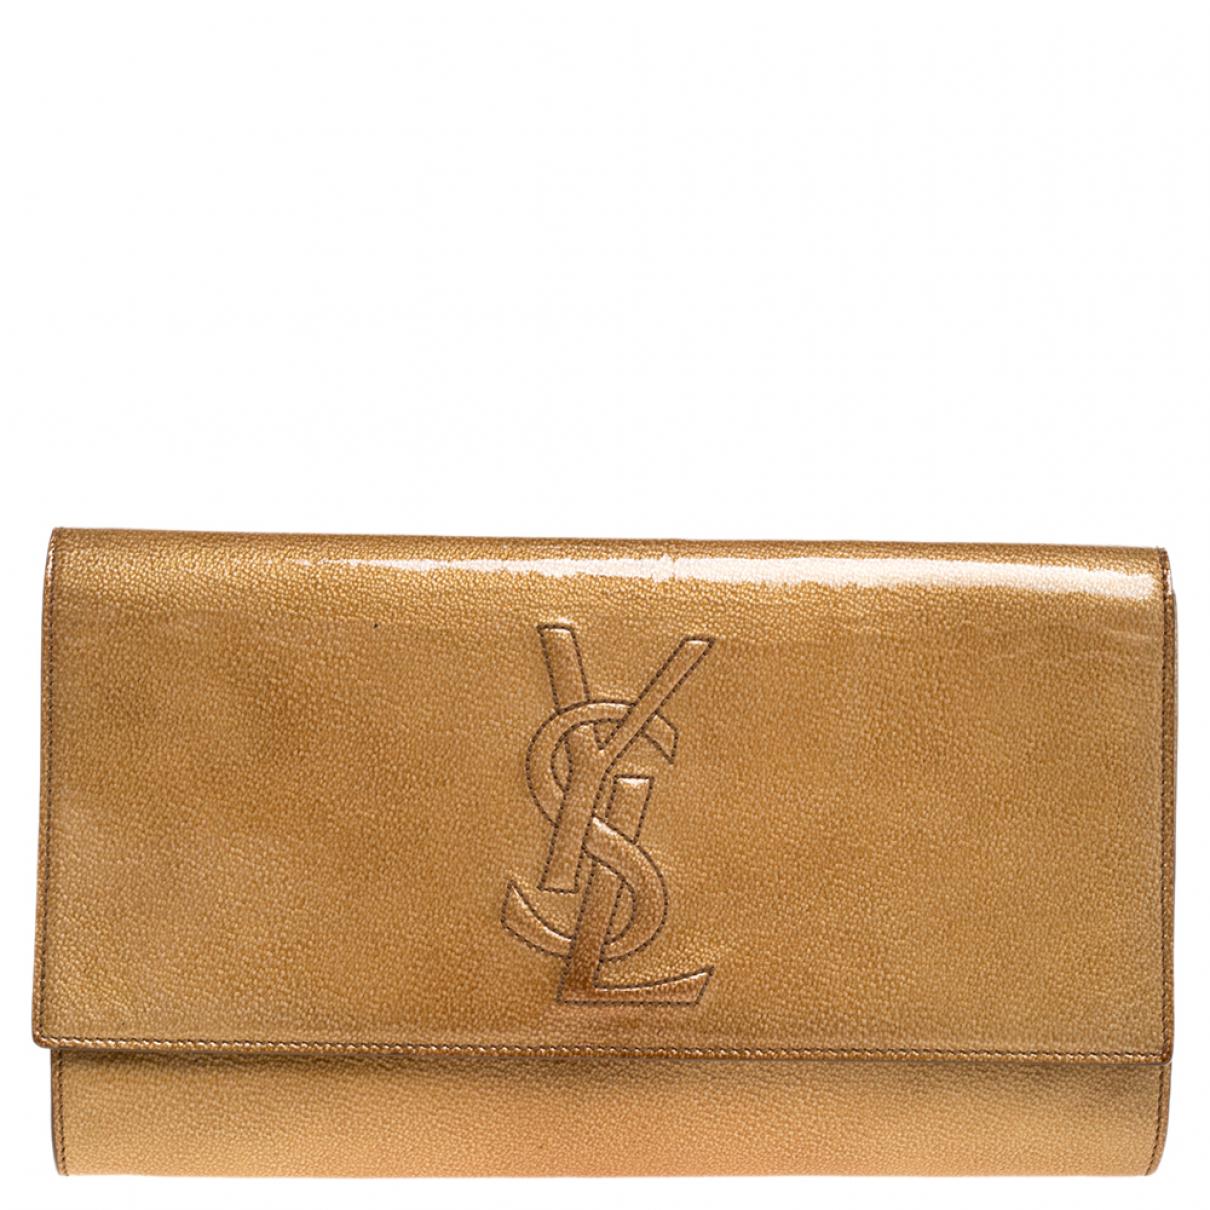 Saint Laurent N Patent leather Clutch bag for Women N